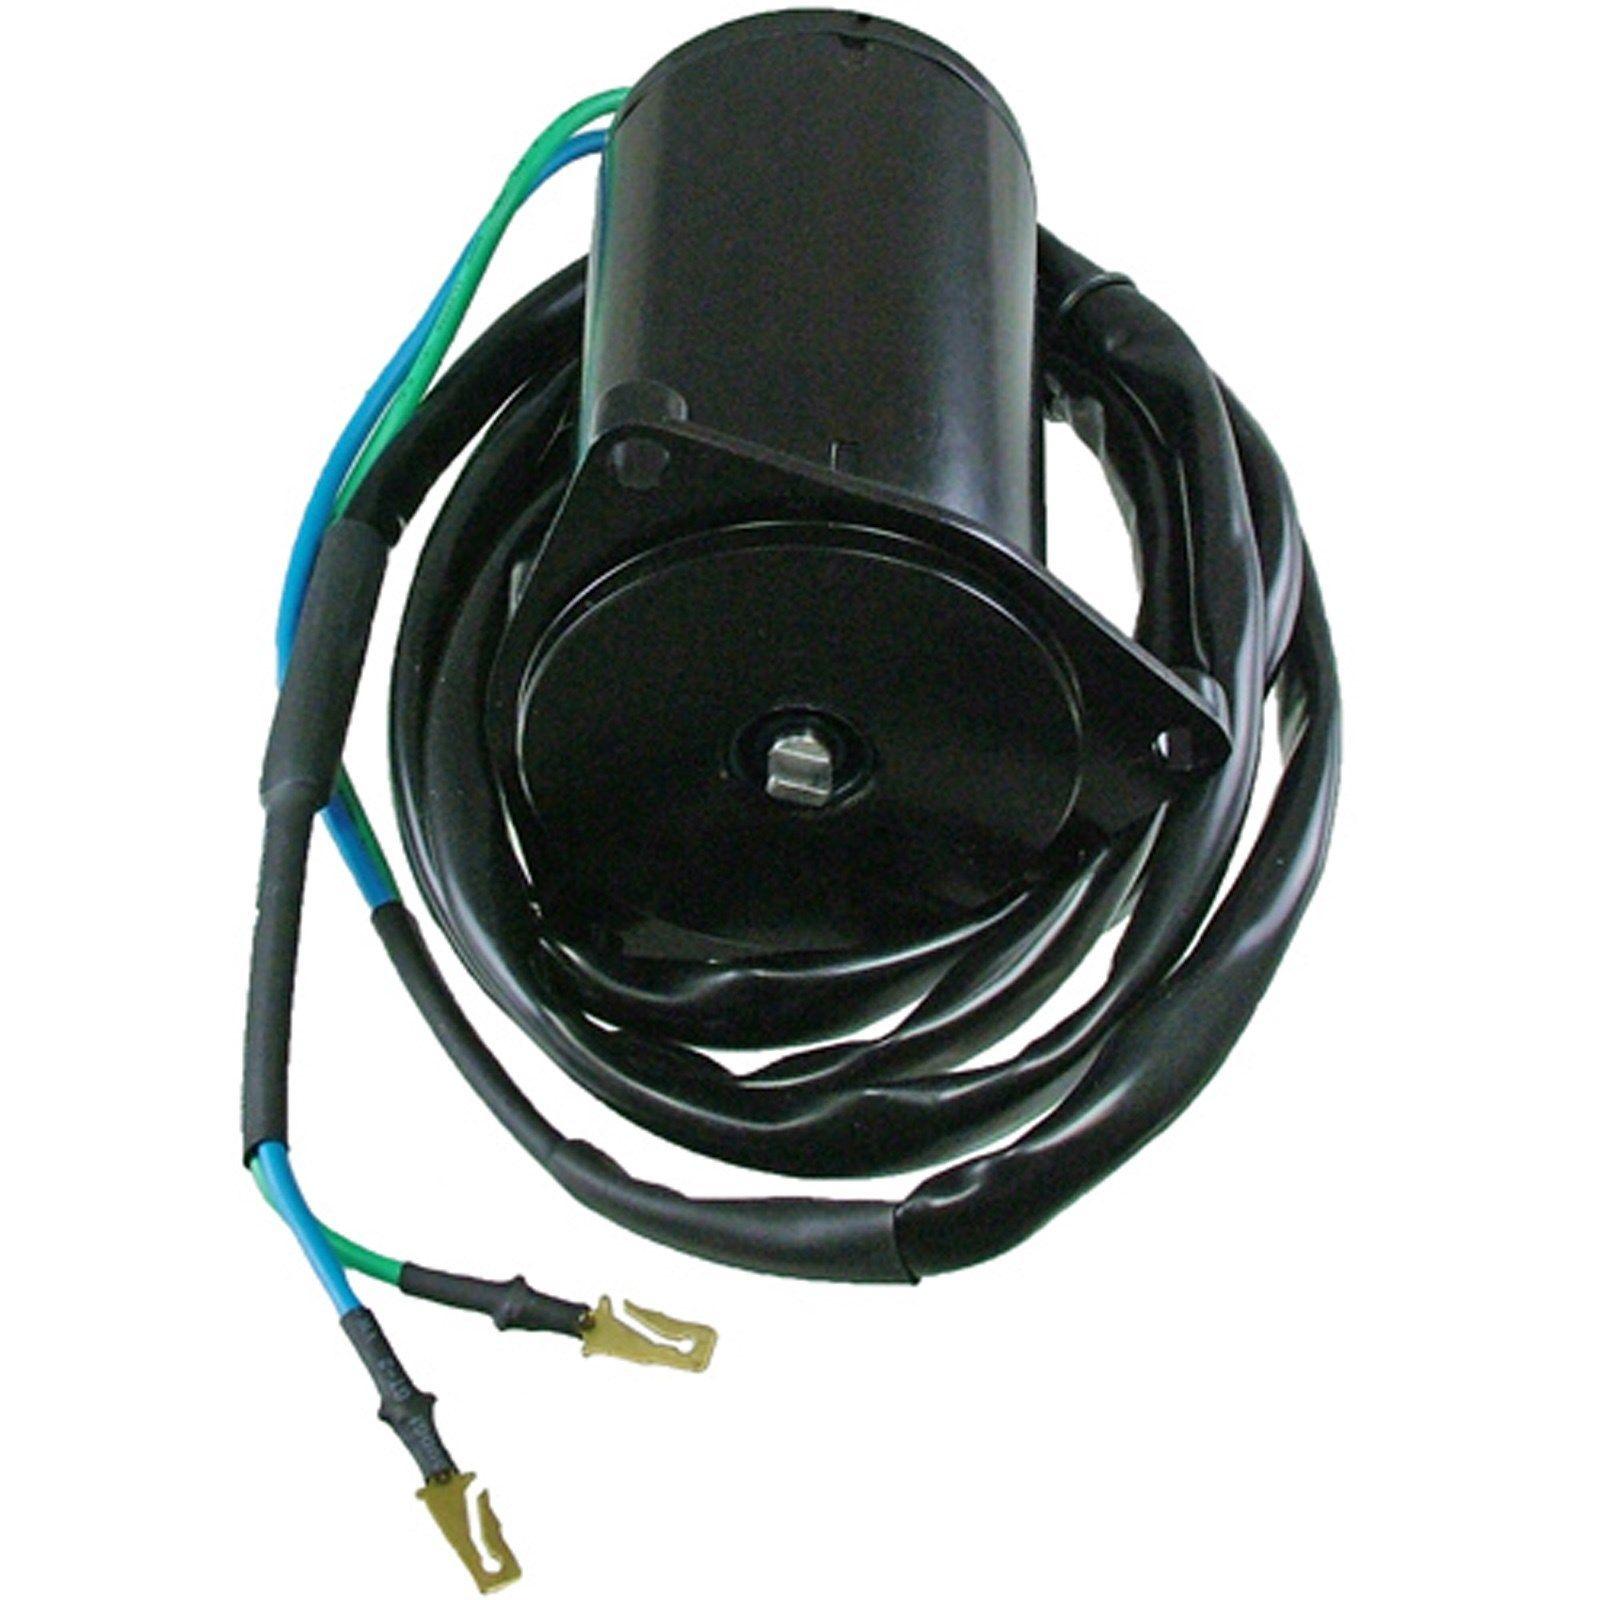 Tilt Trim Motor Replaces OMC 0394176 391264 393259 393988 394176 983019